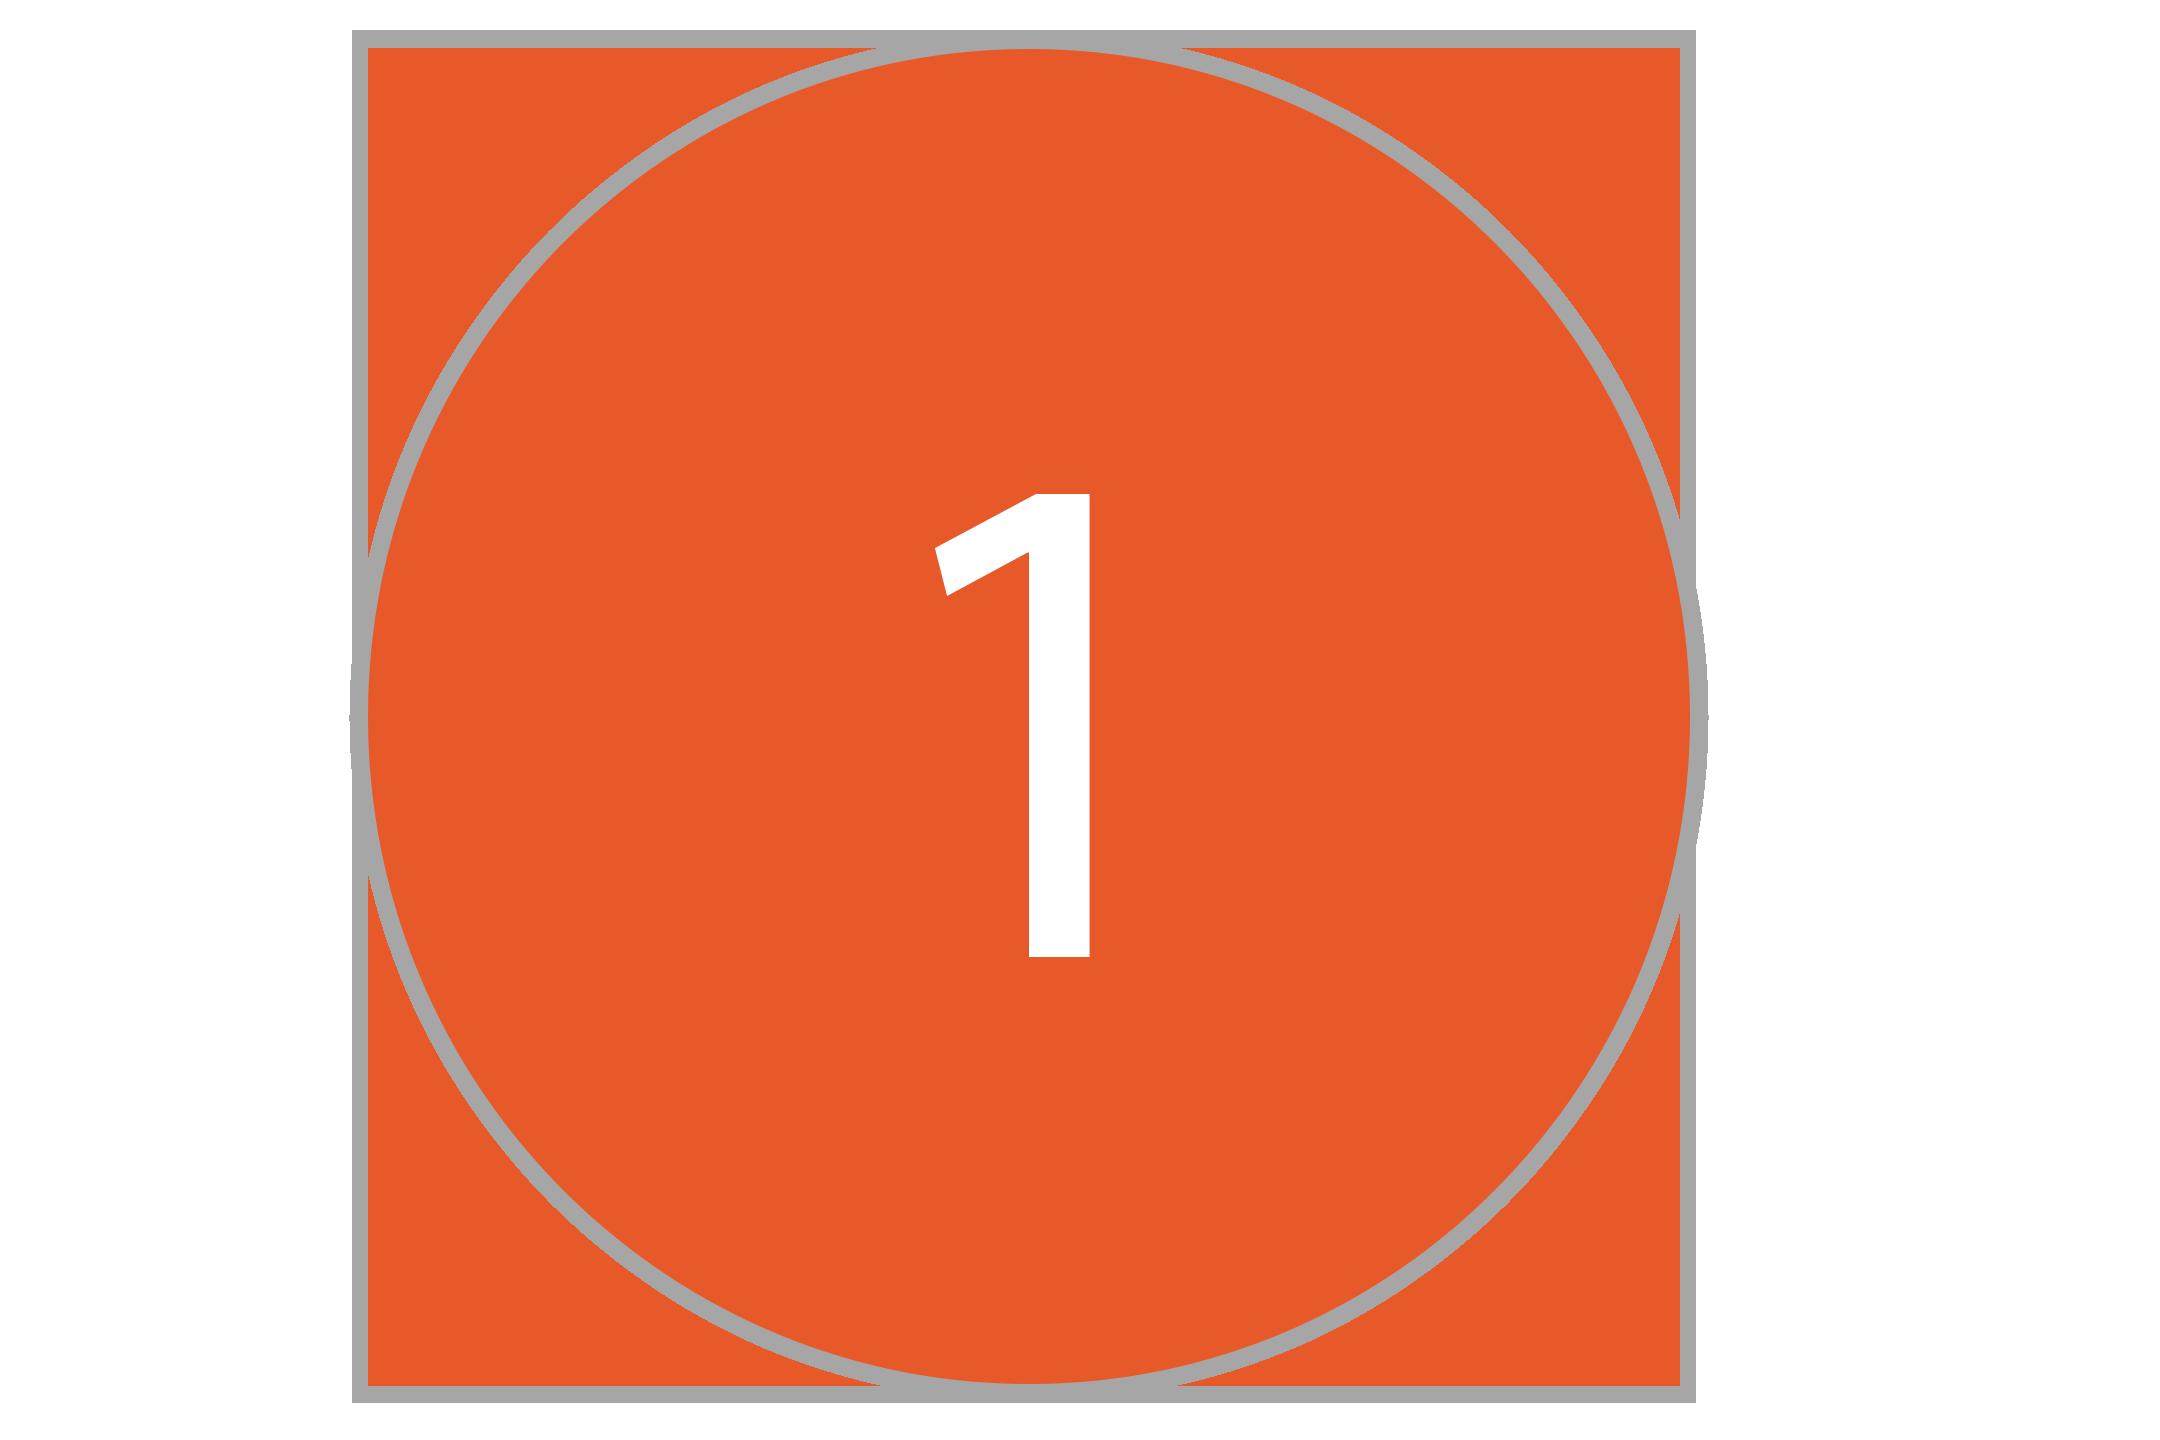 cirkel 1